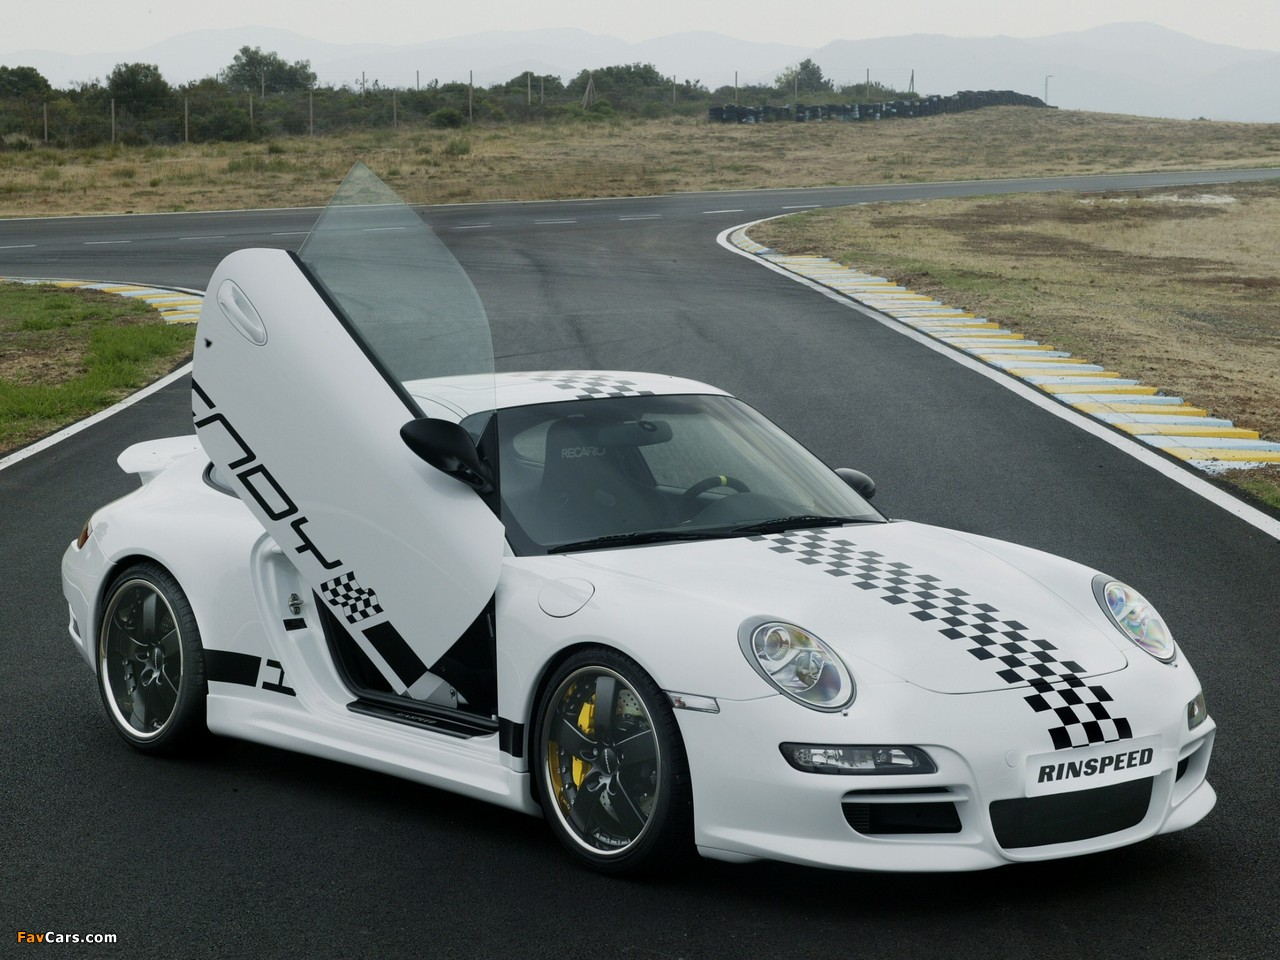 Photos of Rinspeed Porsche Indy (997) 2005 (1280 x 960)